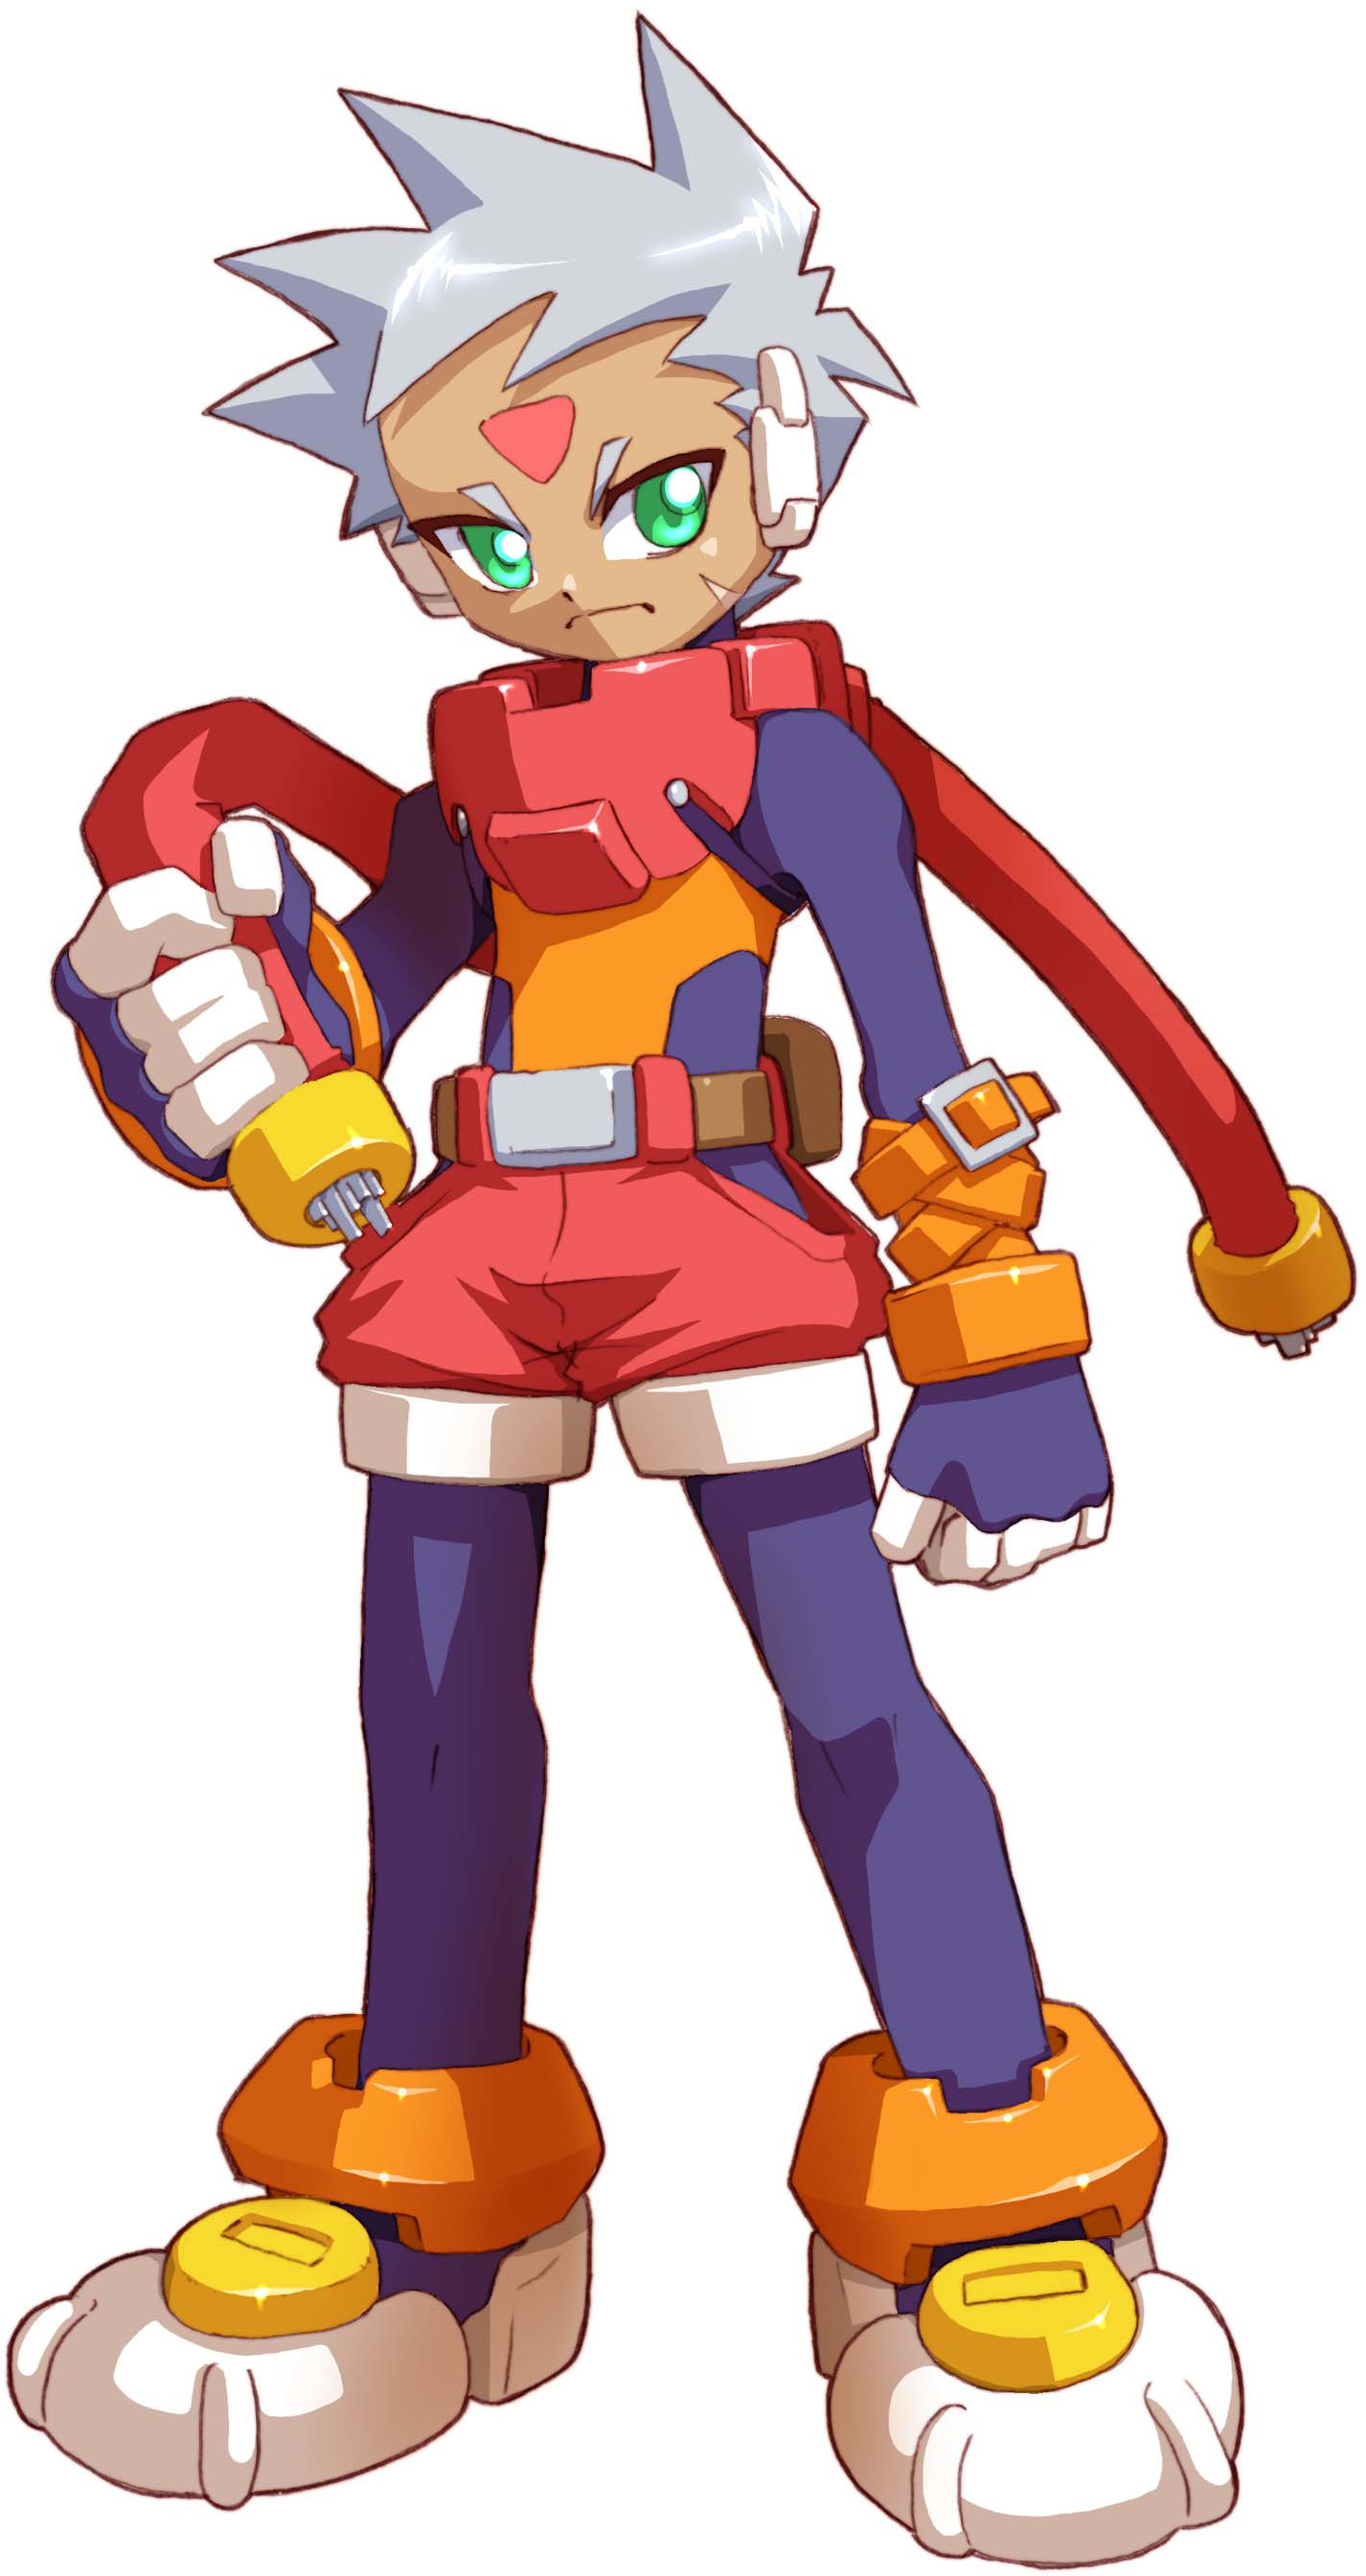 Mega man zx advent mmkb fandom powered by wikia gray voltagebd Images